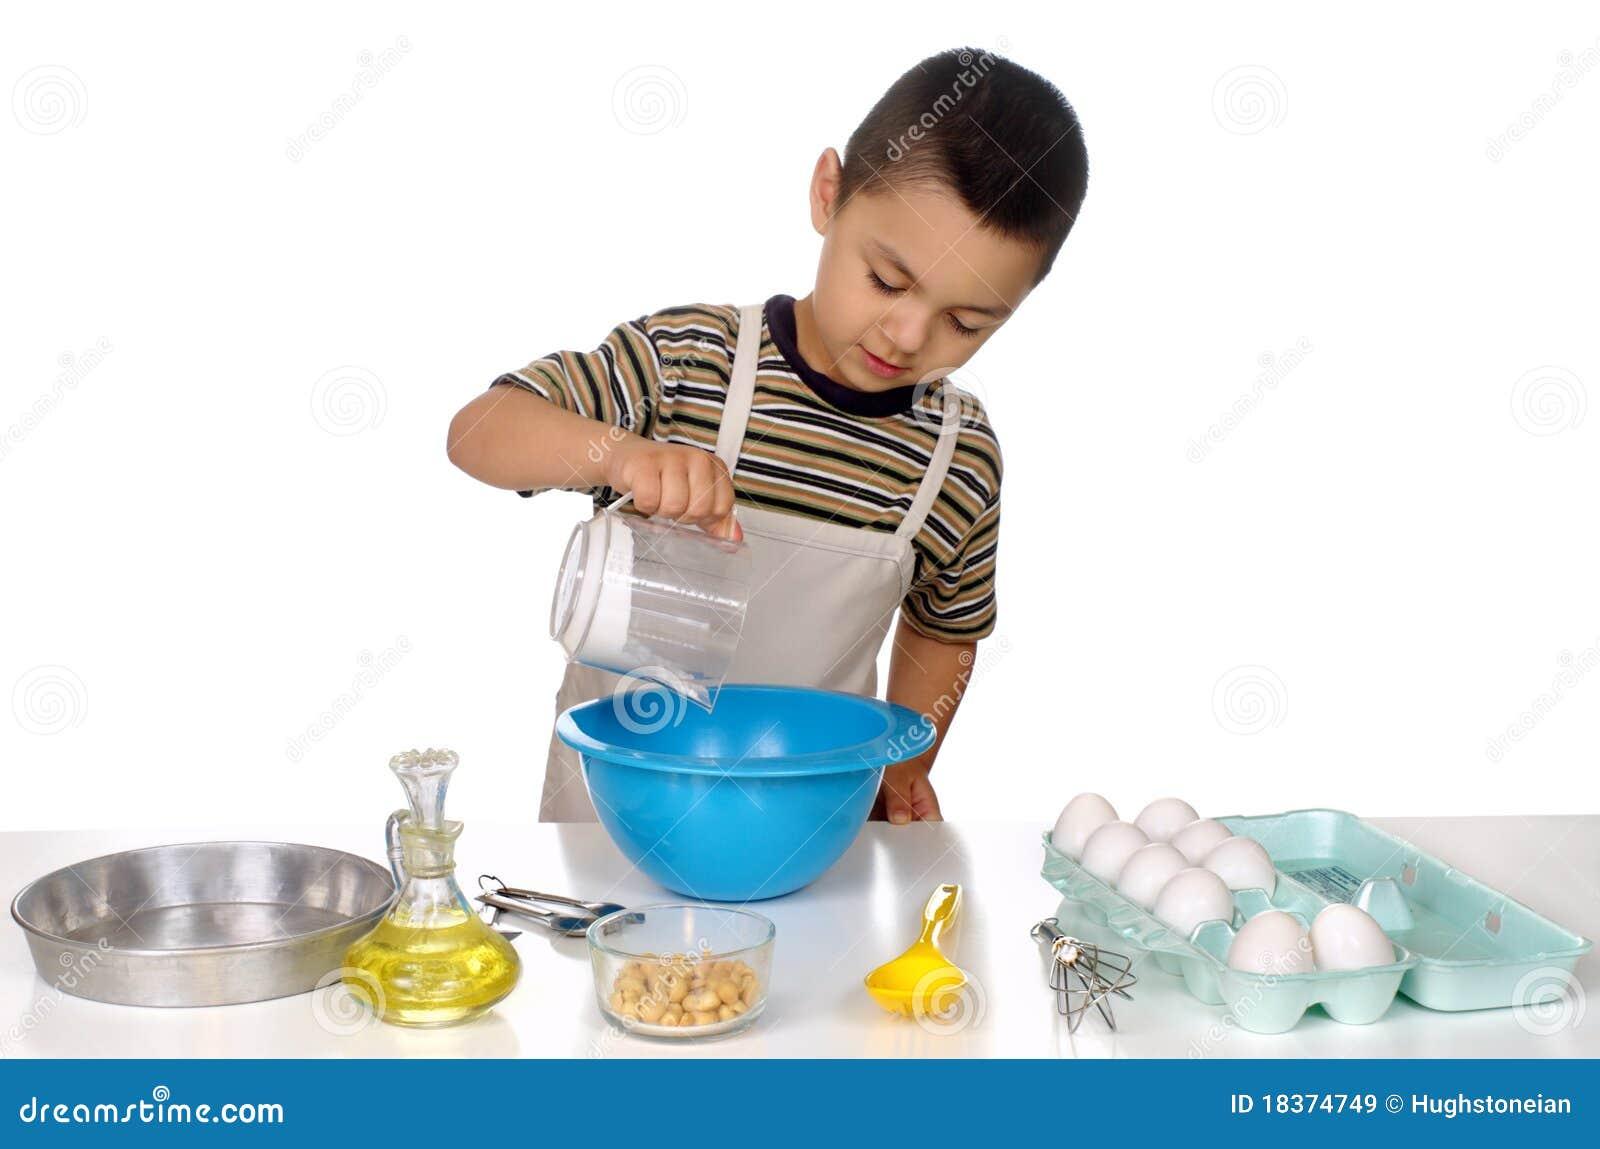 Cake Making Games For Boys